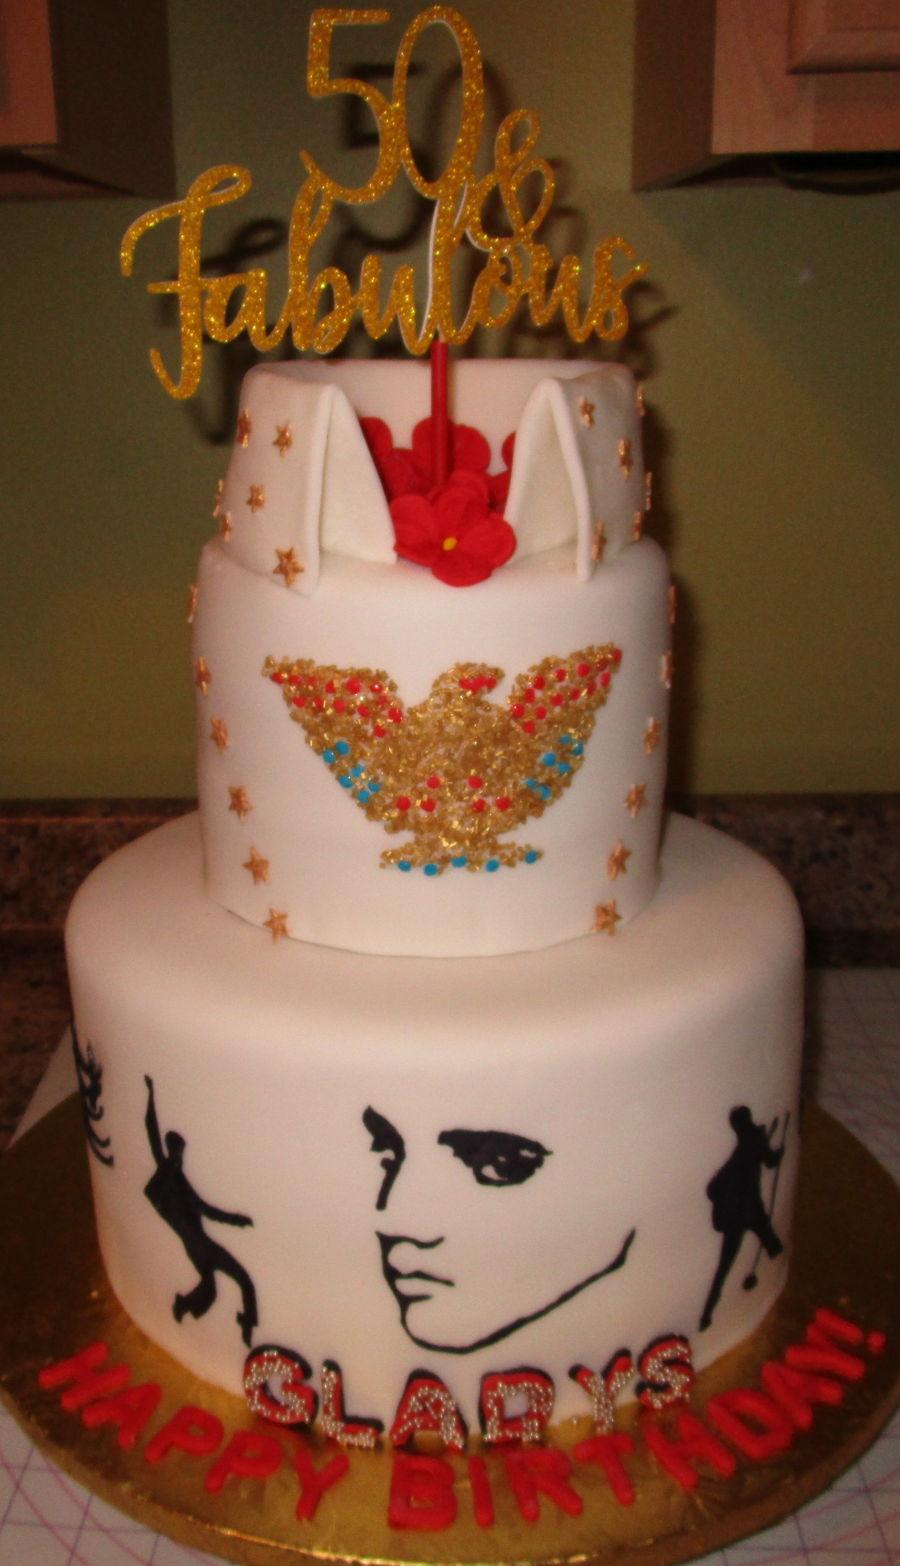 Surprising Gladys Elvis Birthday Cake Cakecentral Com Birthday Cards Printable Opercafe Filternl